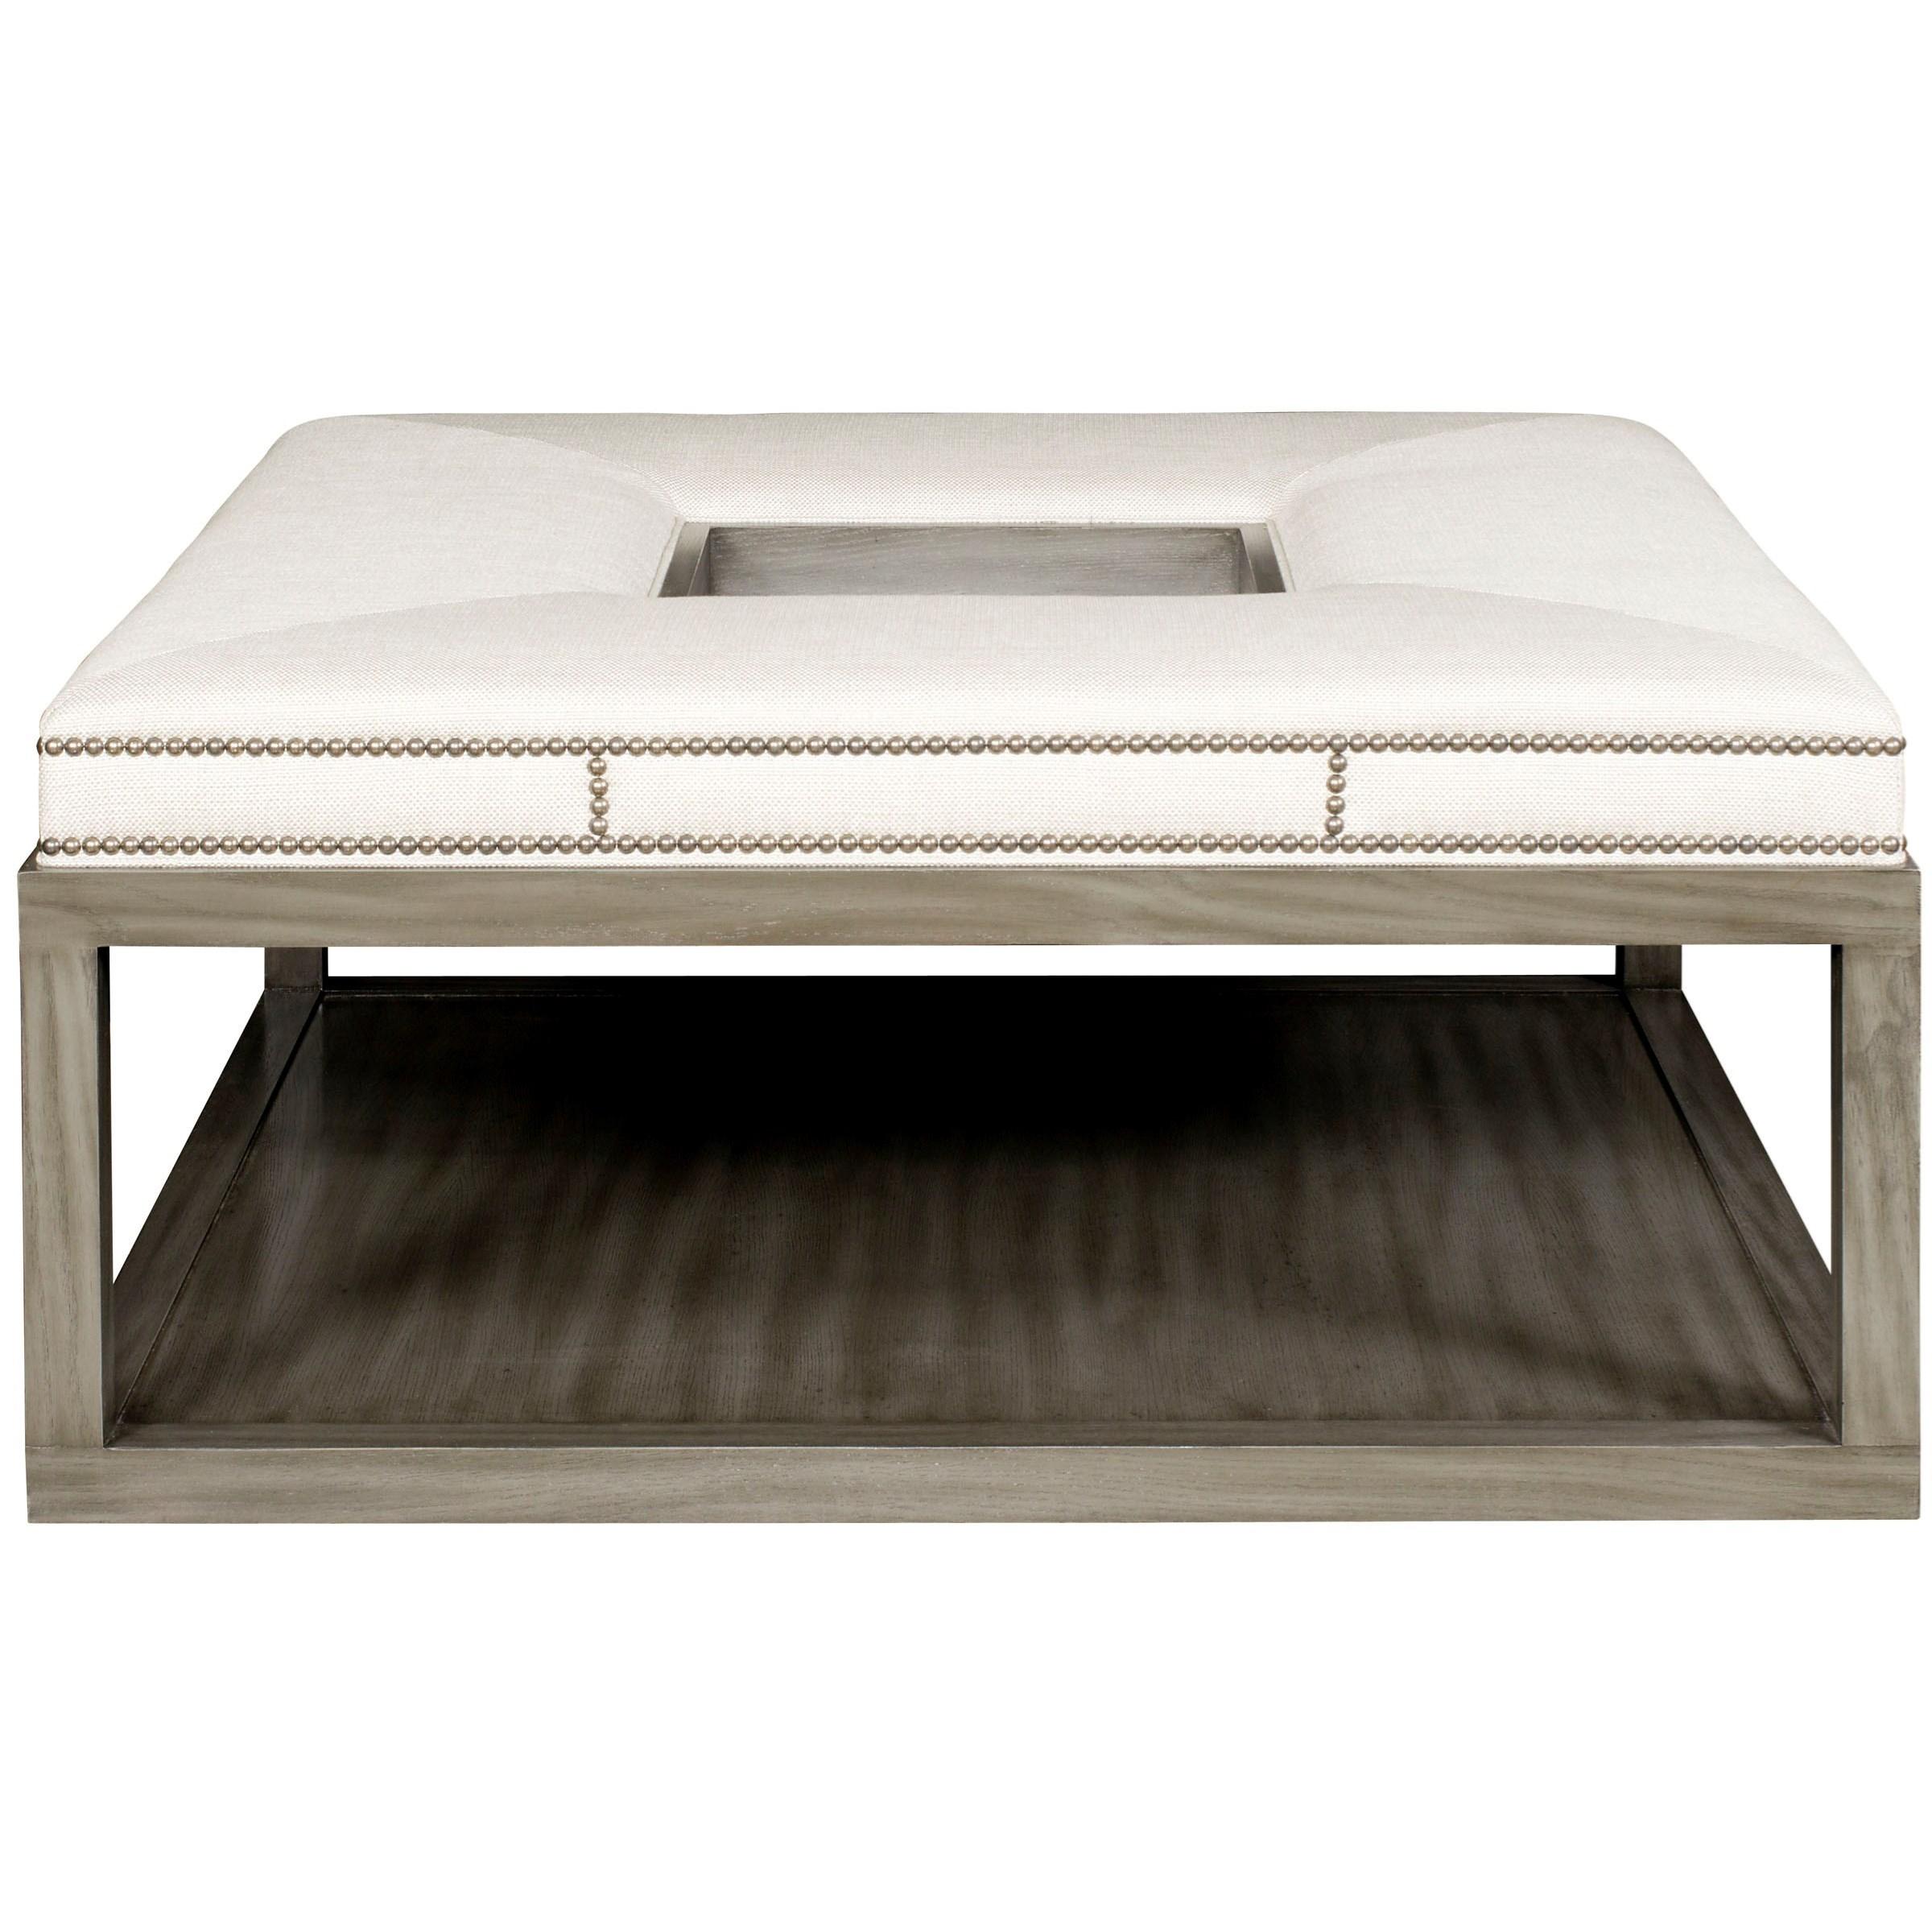 Vanguard Furniture Michael Weiss Wayland Square Wood